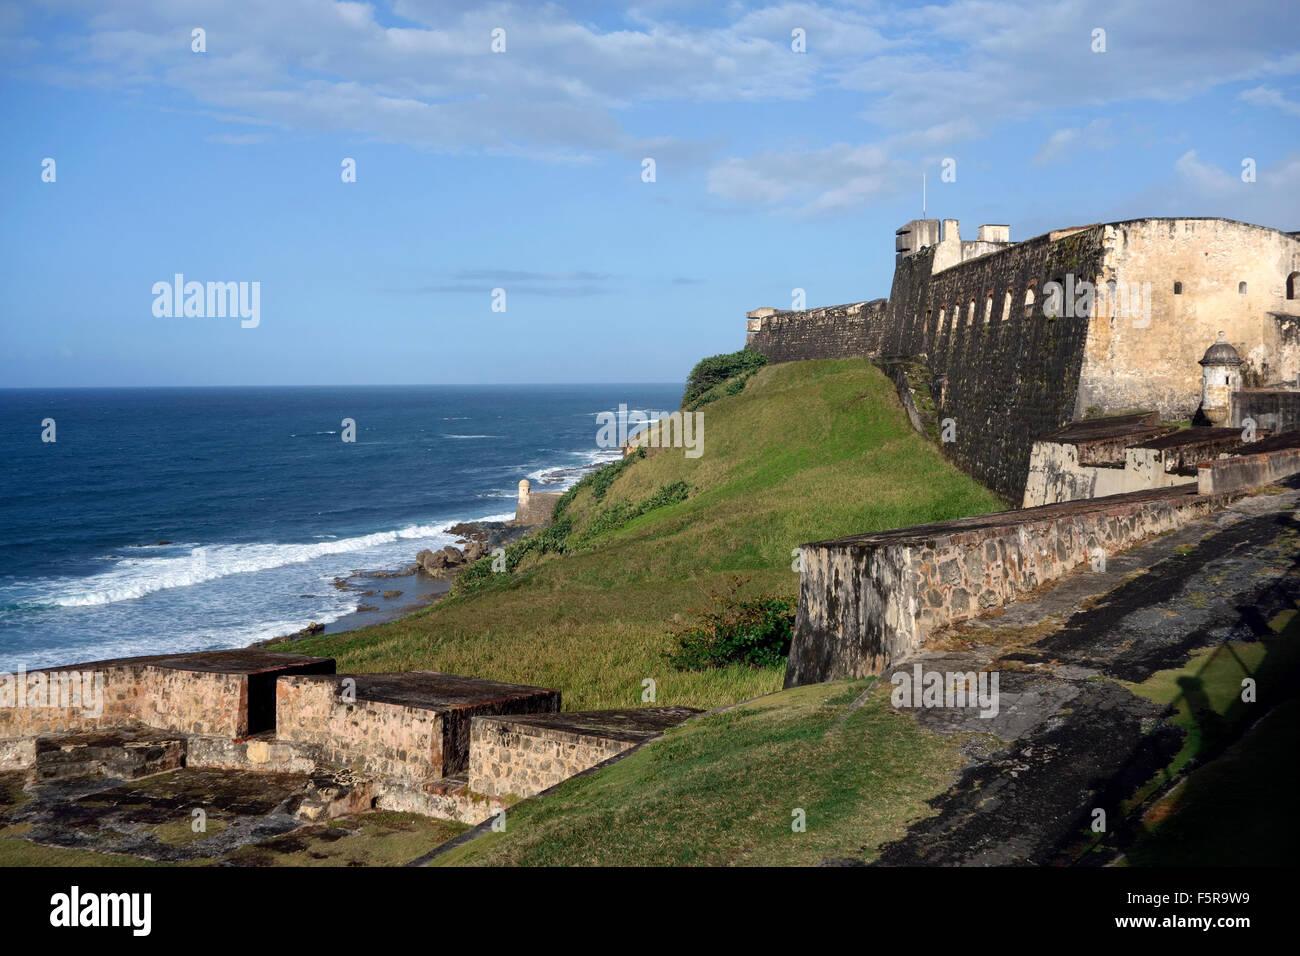 Fuerte San Cristóbal, San Juan, Puerto Rico, el Caribe Imagen De Stock